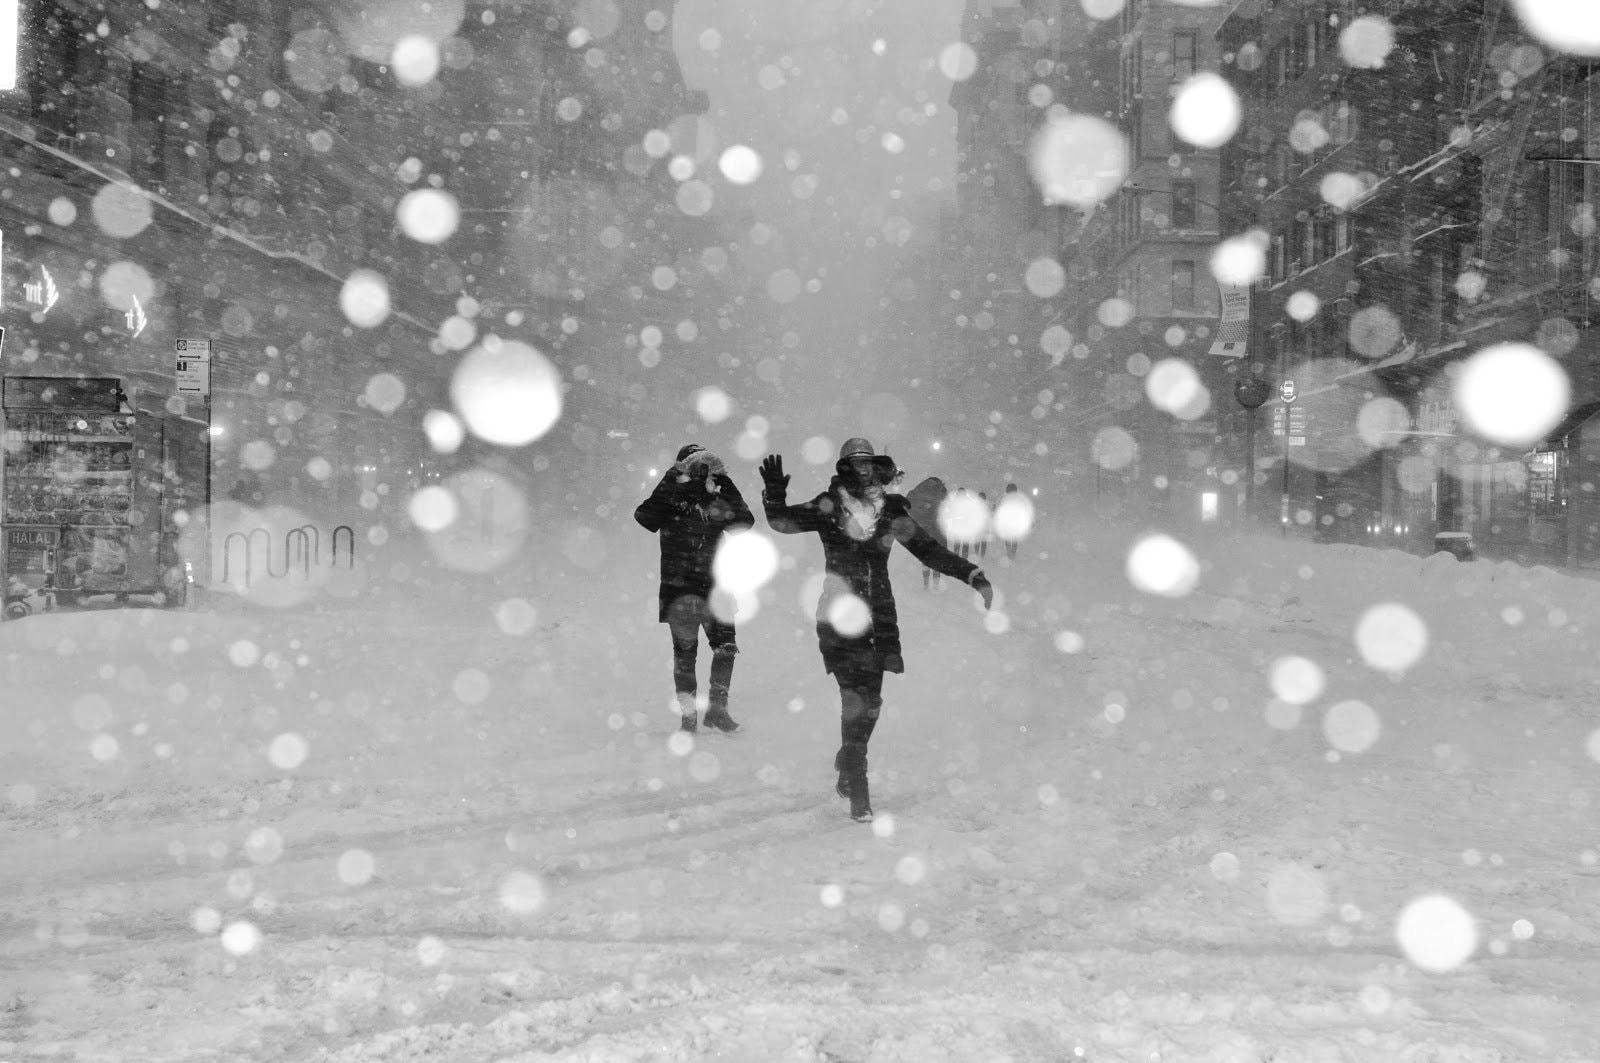 People walking through a snow storm by Jeffrey Blum